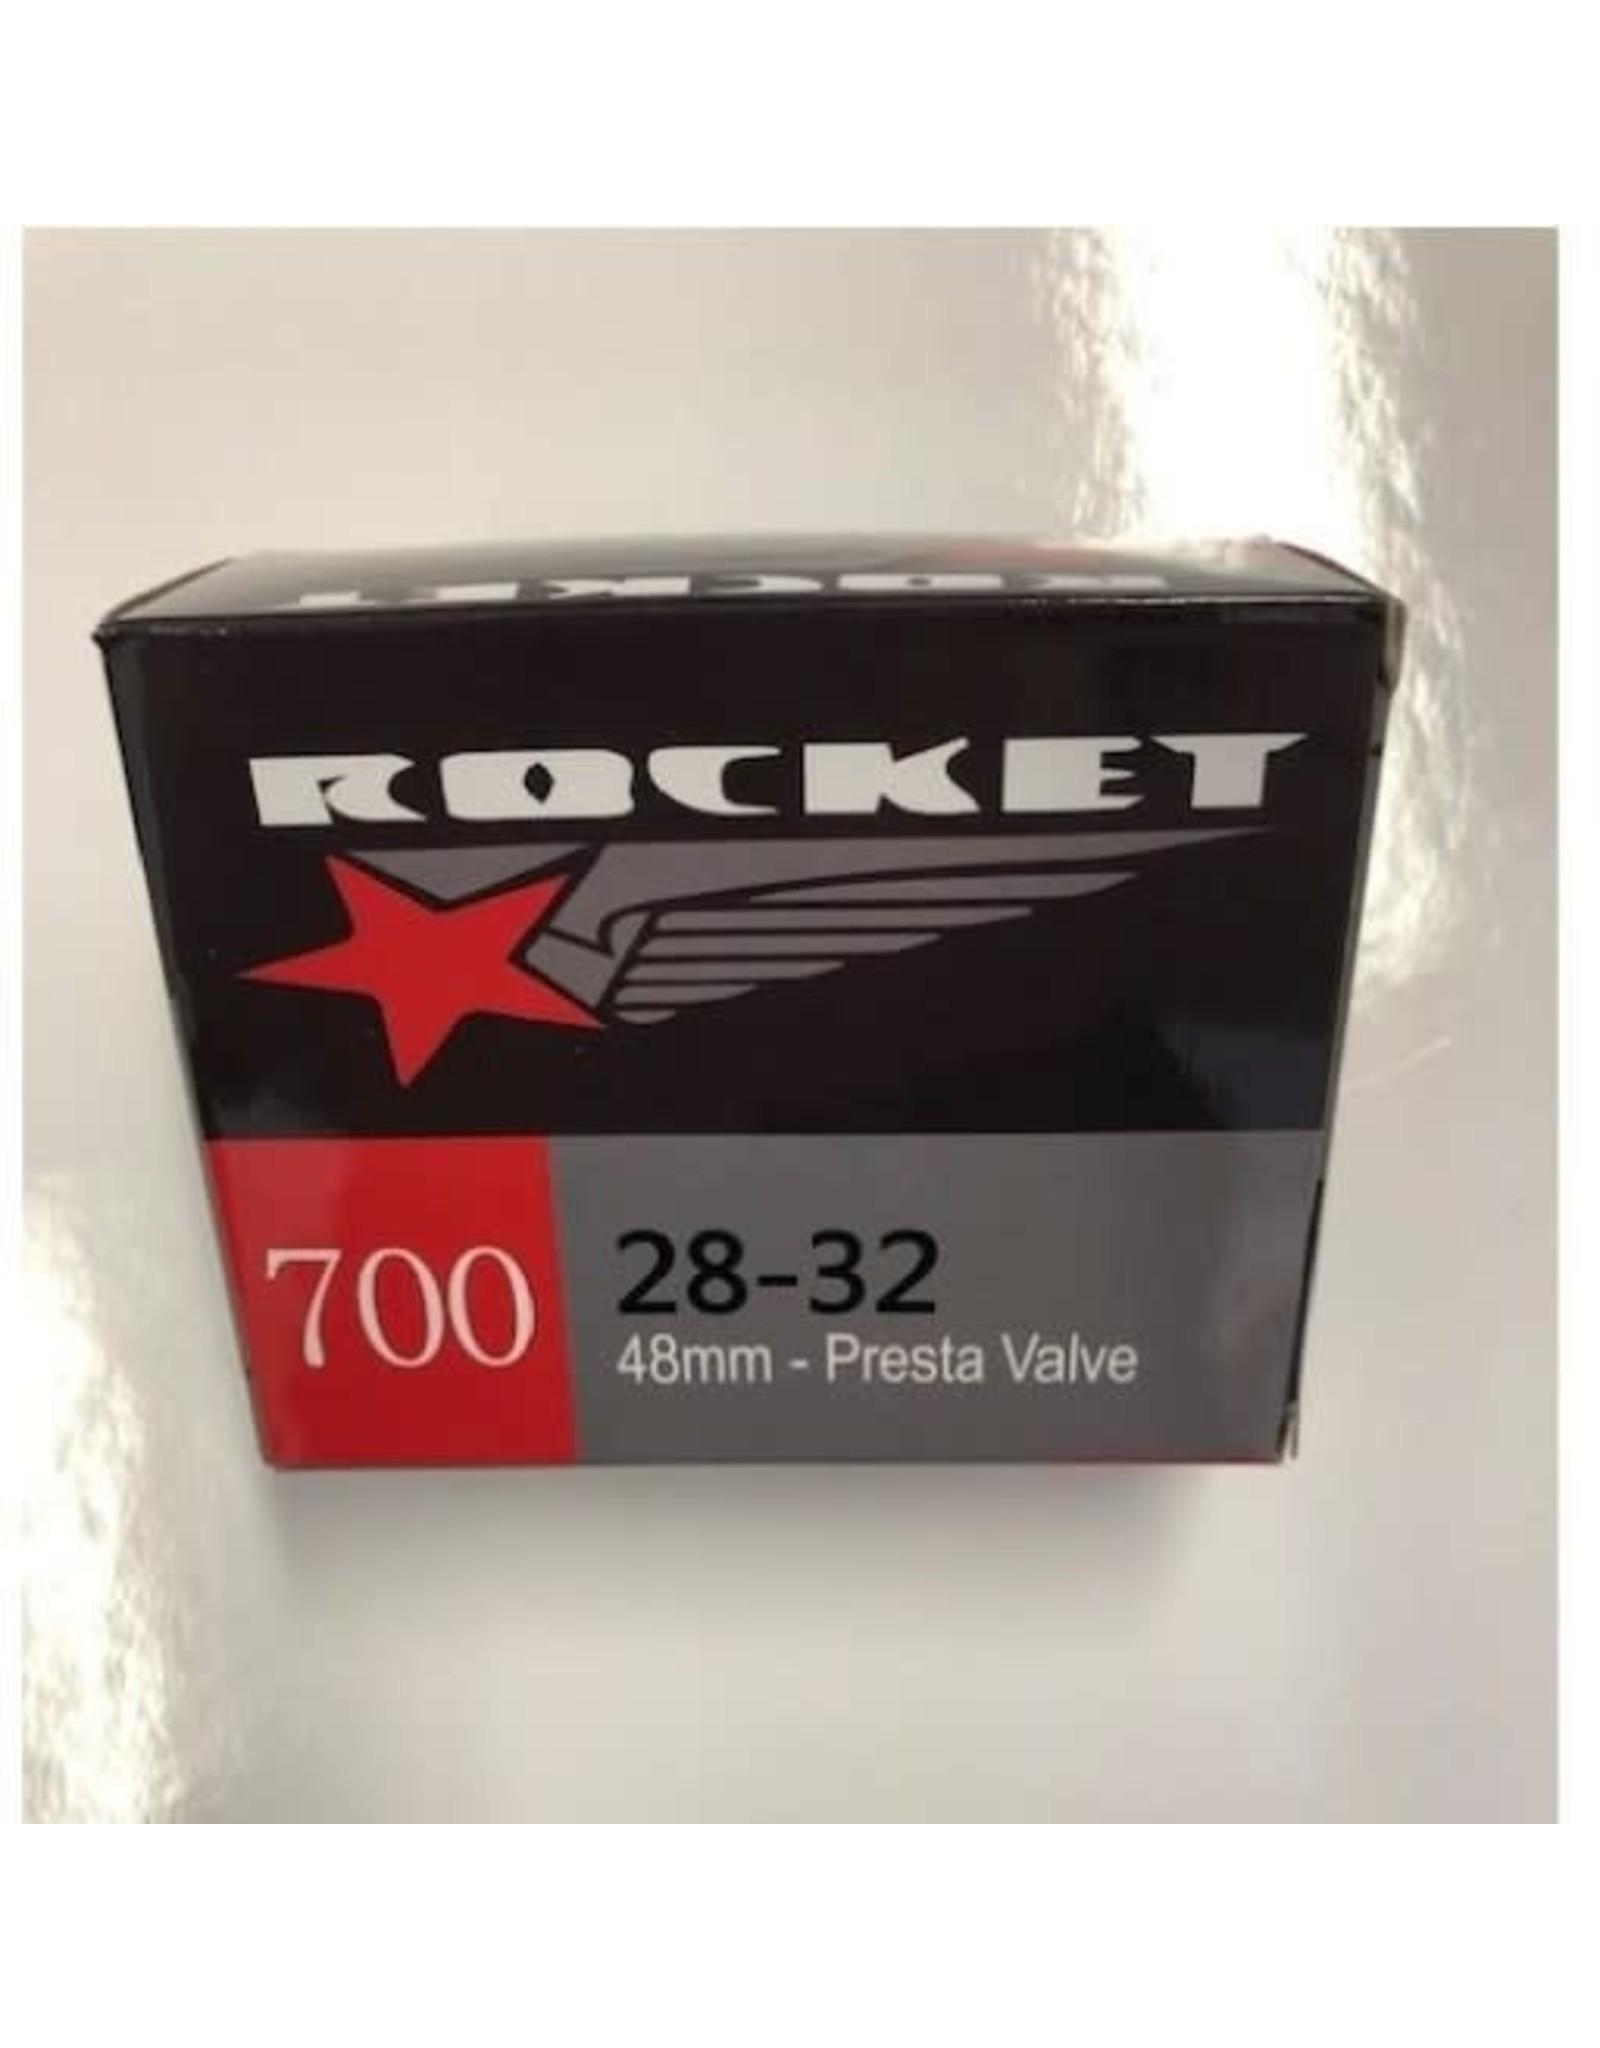 ROCKET 700X25-32 FV